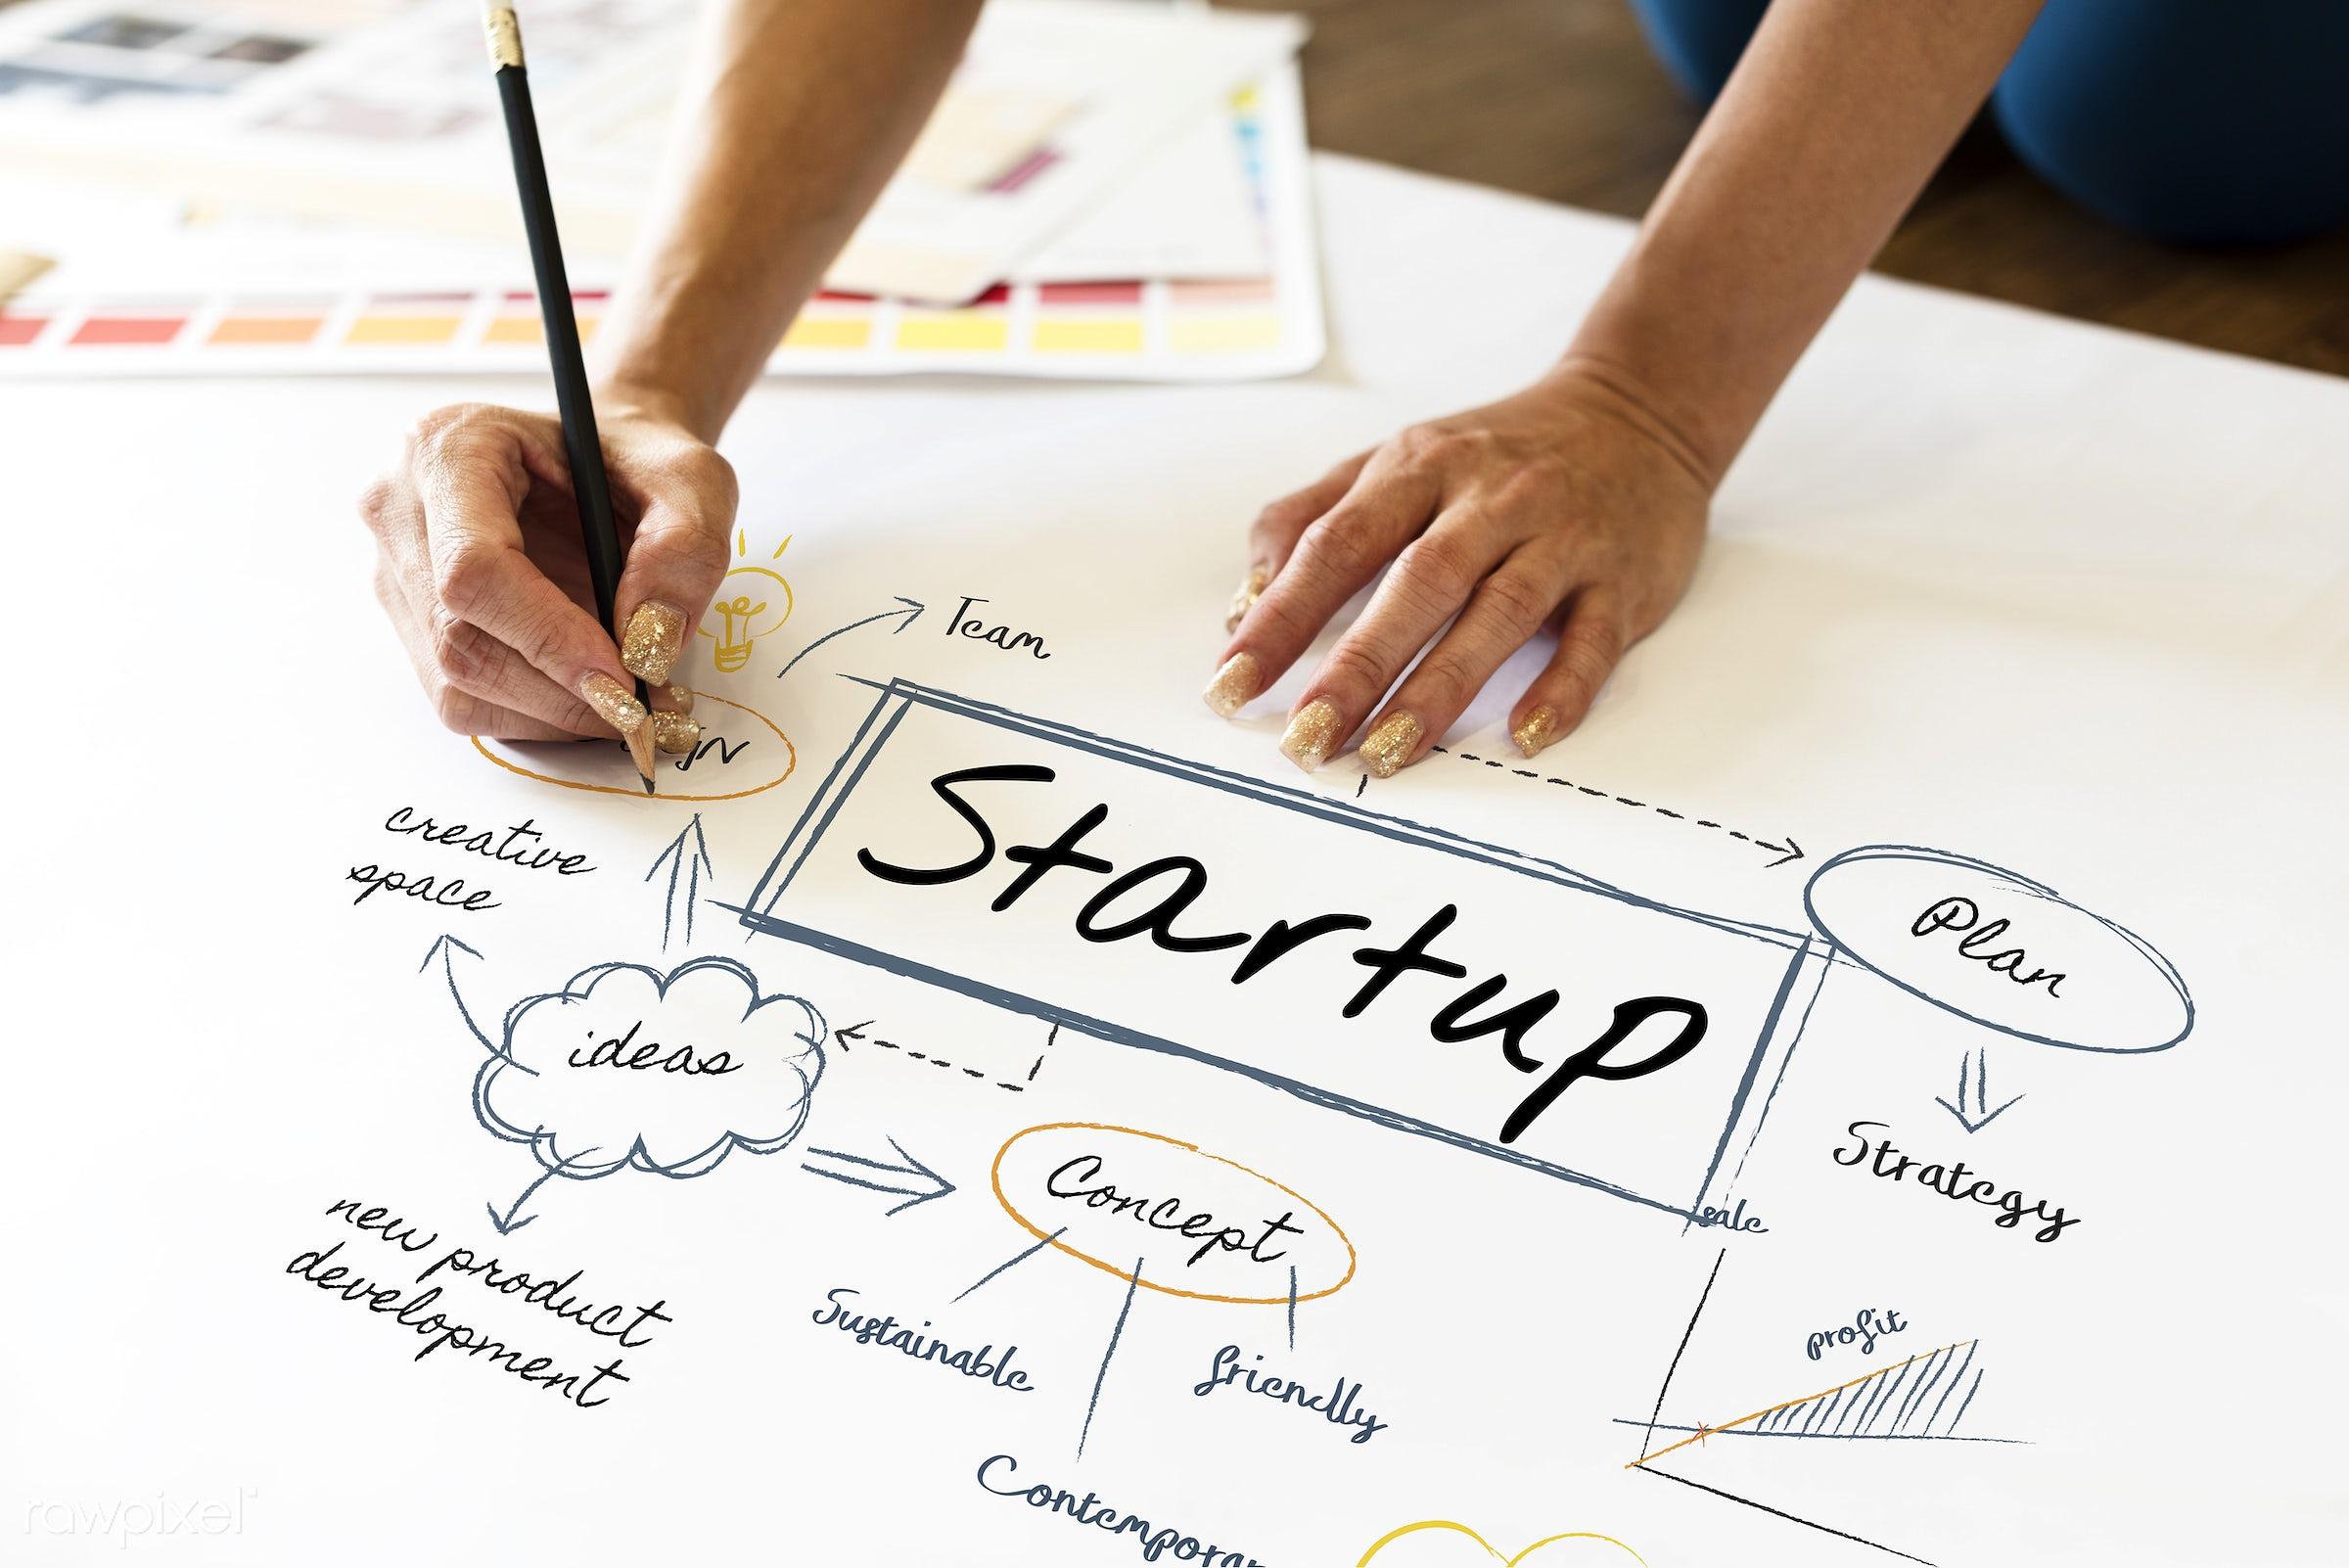 art, business, chart, concept, creation, creative, creativity, design, development, diagram, drawing, graphic, hands, ideas...